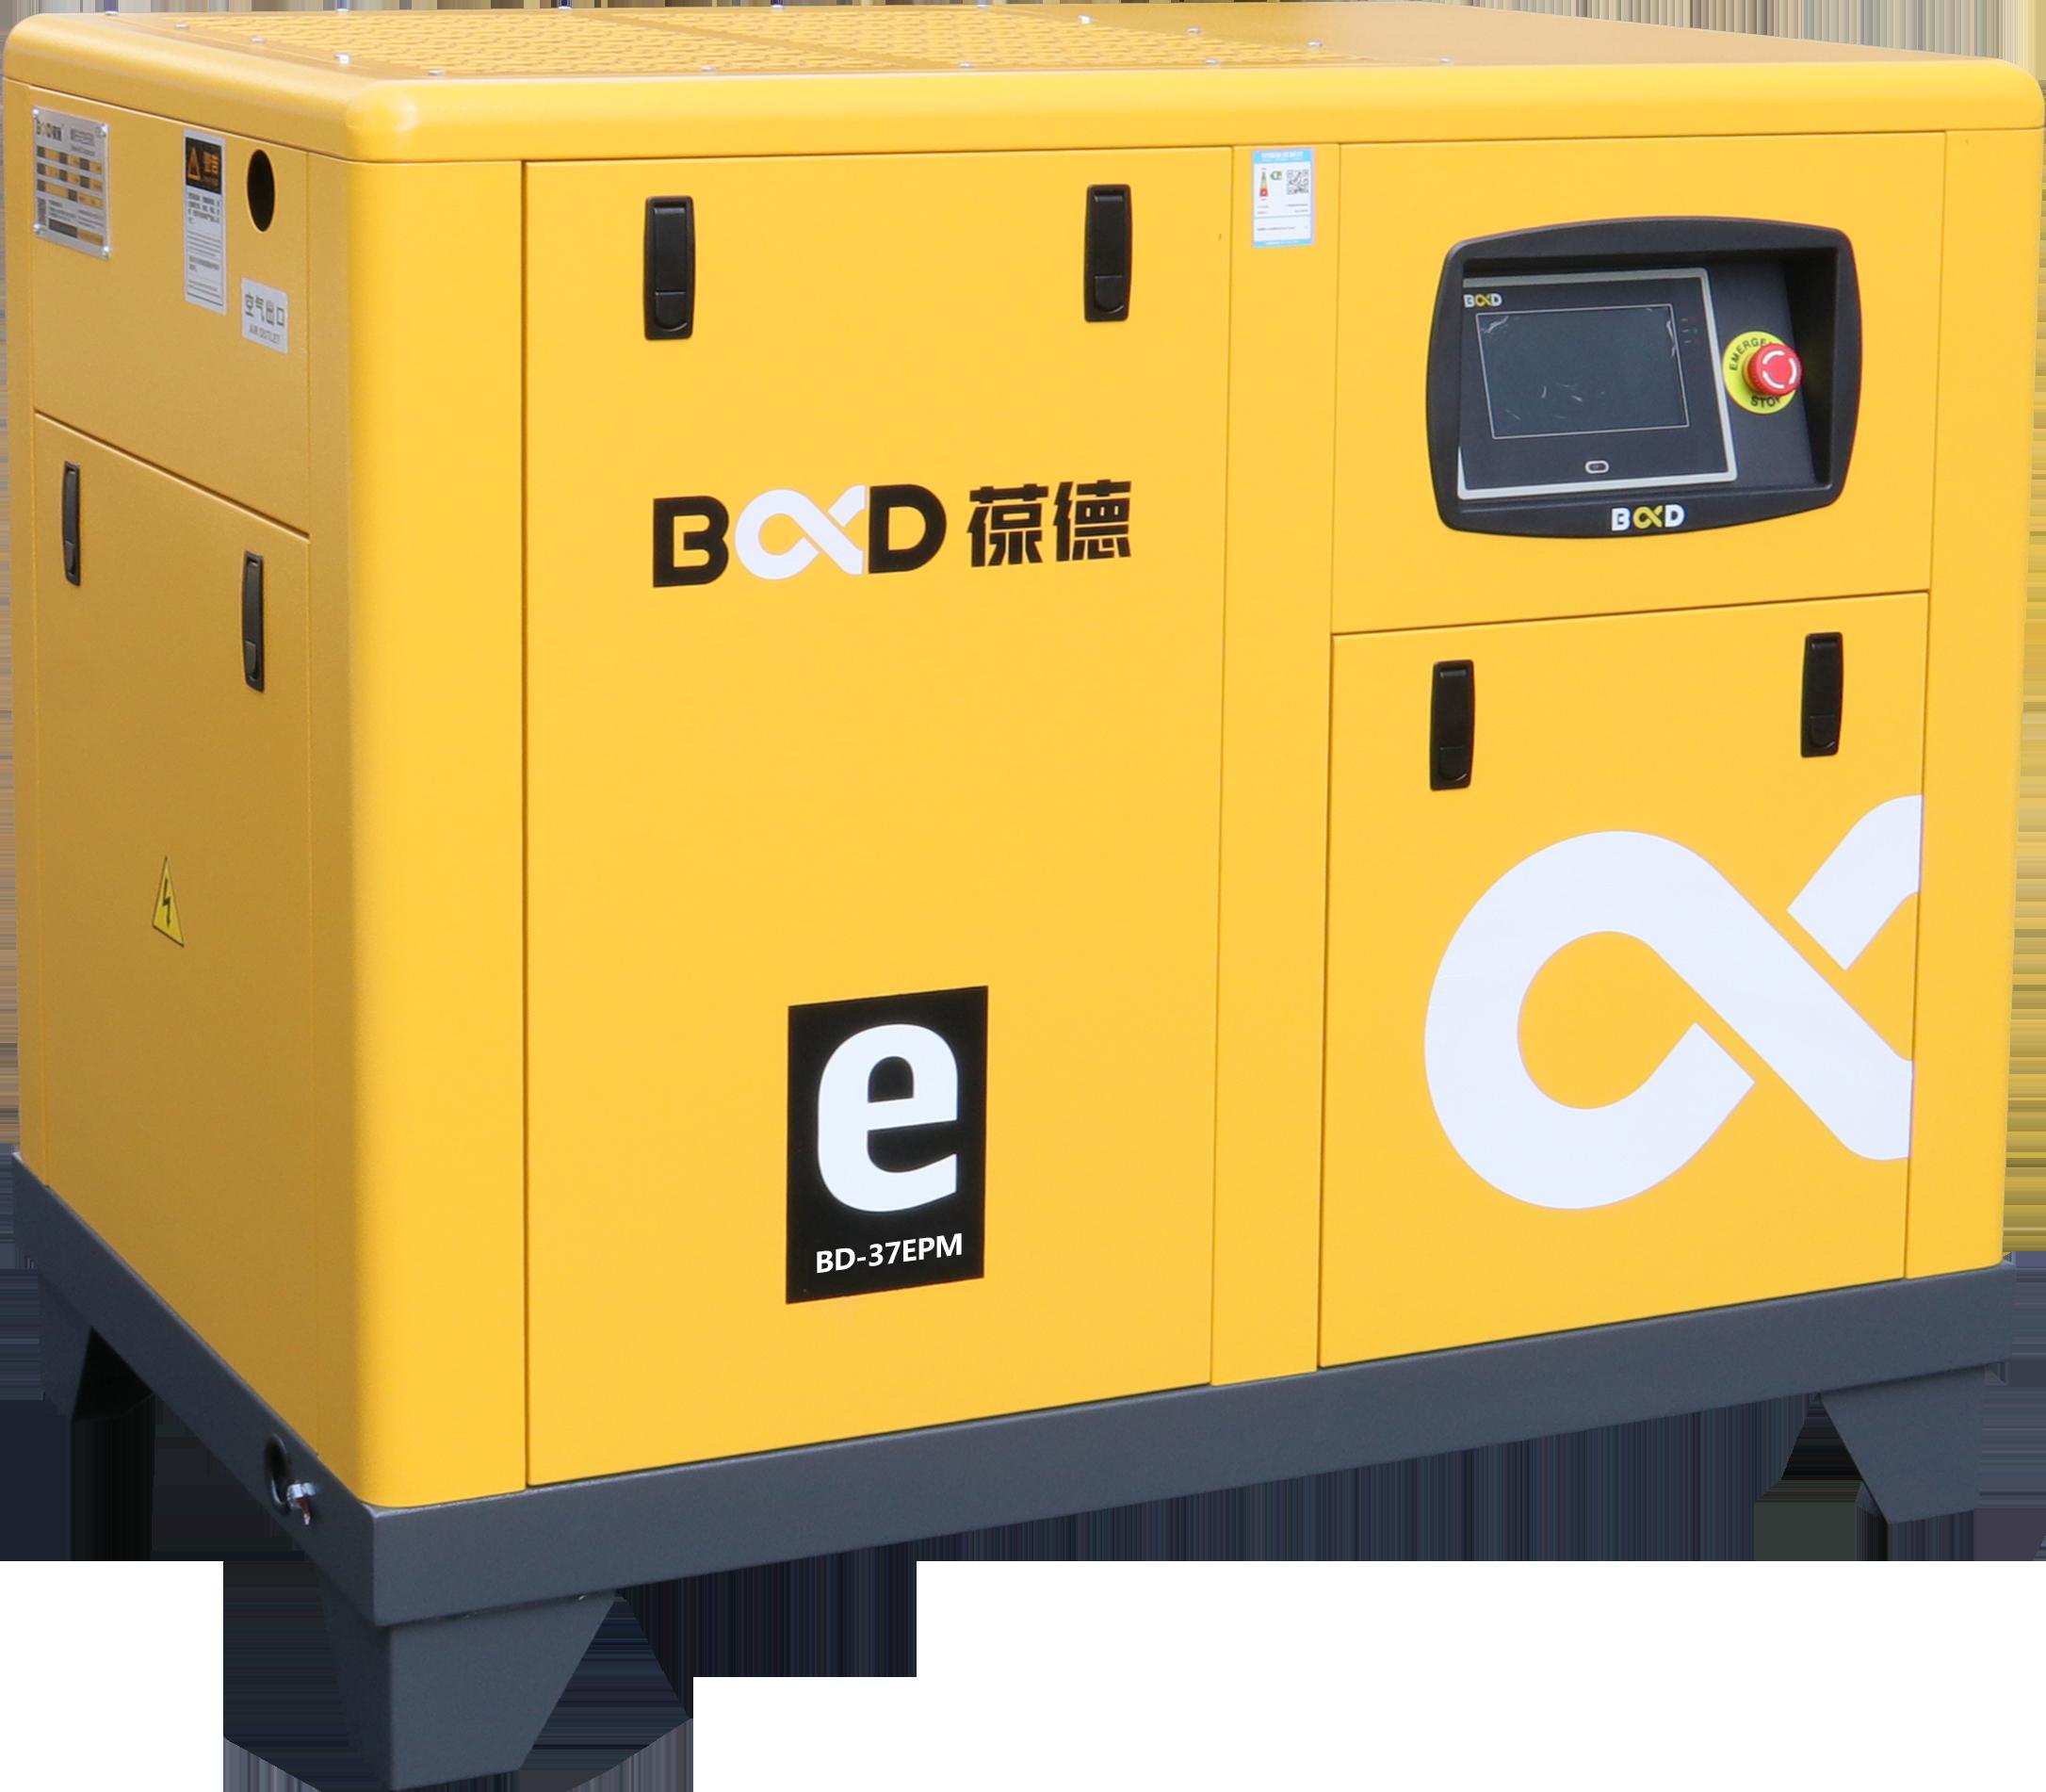 Save Up 42 Energy Pm Vsd Screw Air Compressor Bd 37epm In 2020 Air Compressor Locker Storage Save Energy